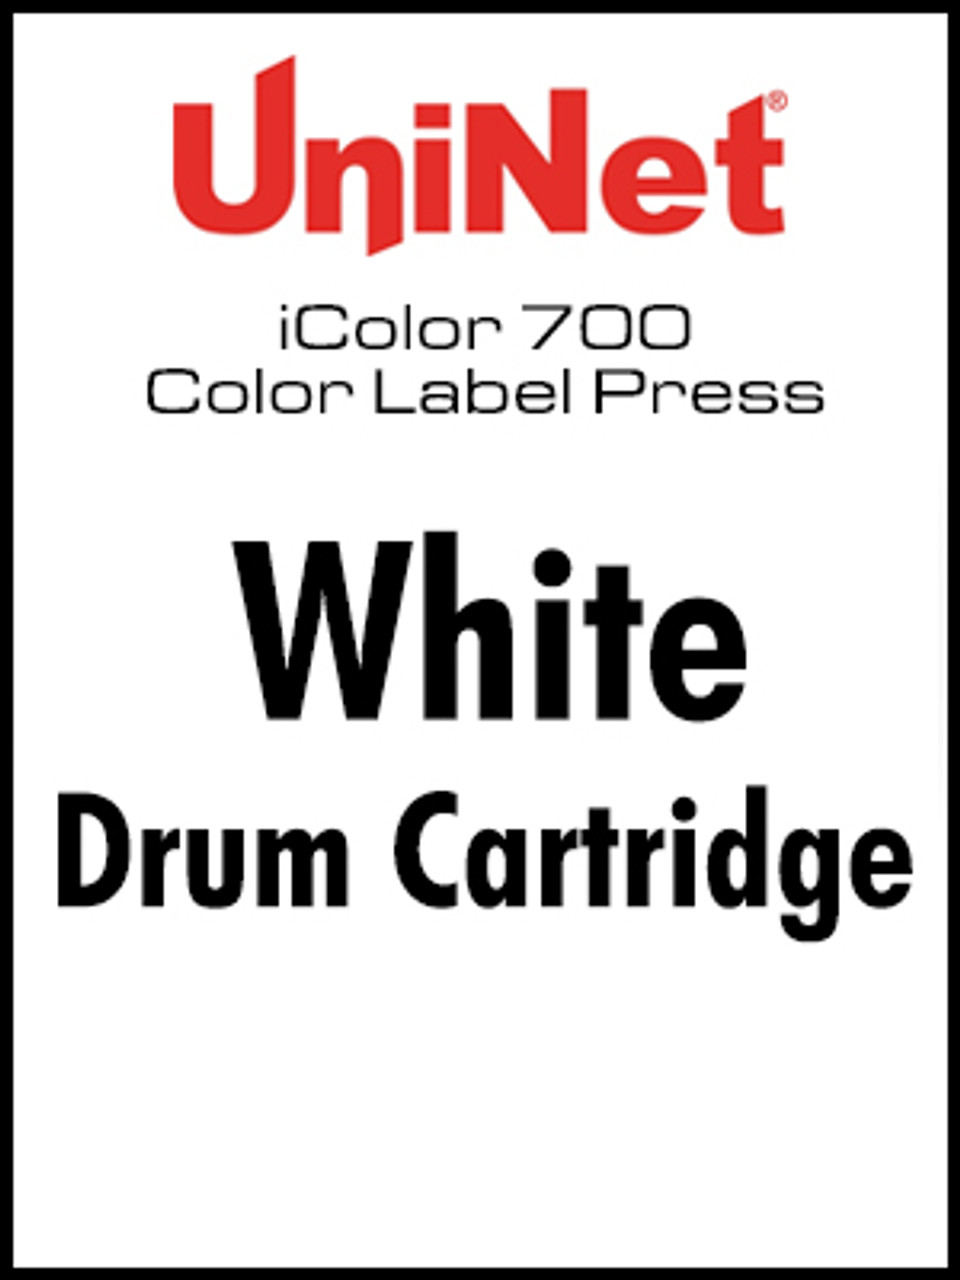 iColor 700 Digital Press White drum cartridge